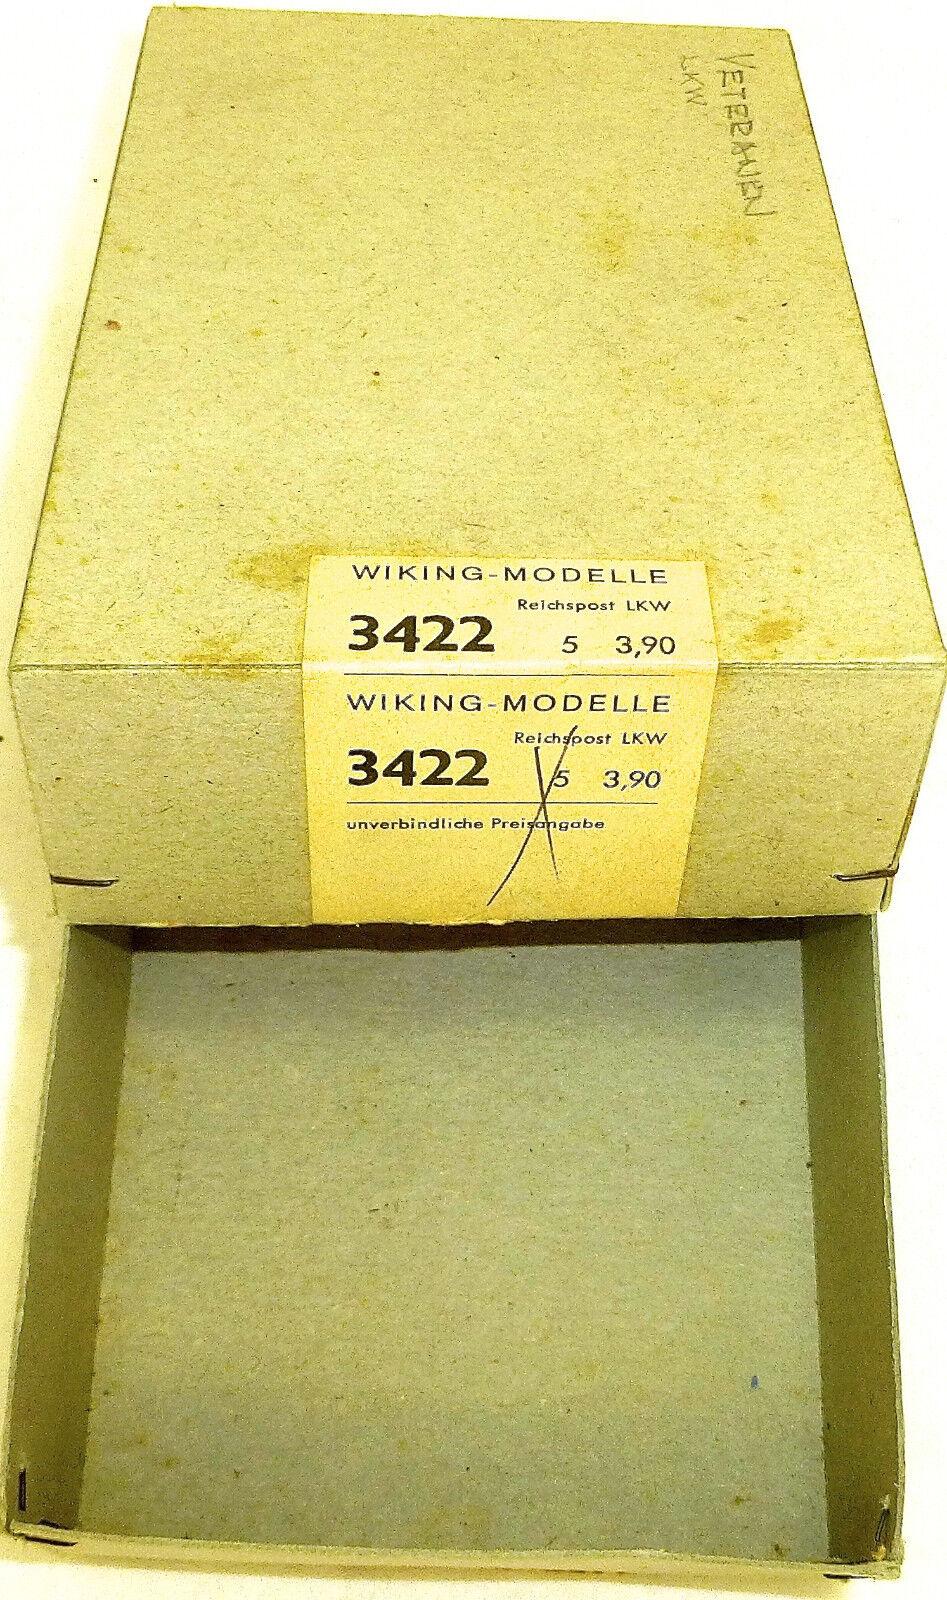 Reichspost Camion Wiking Modèles Modèles Modèles Boîte Vide Carton Wiking 3422 H0 1 87 Å f2e9c3